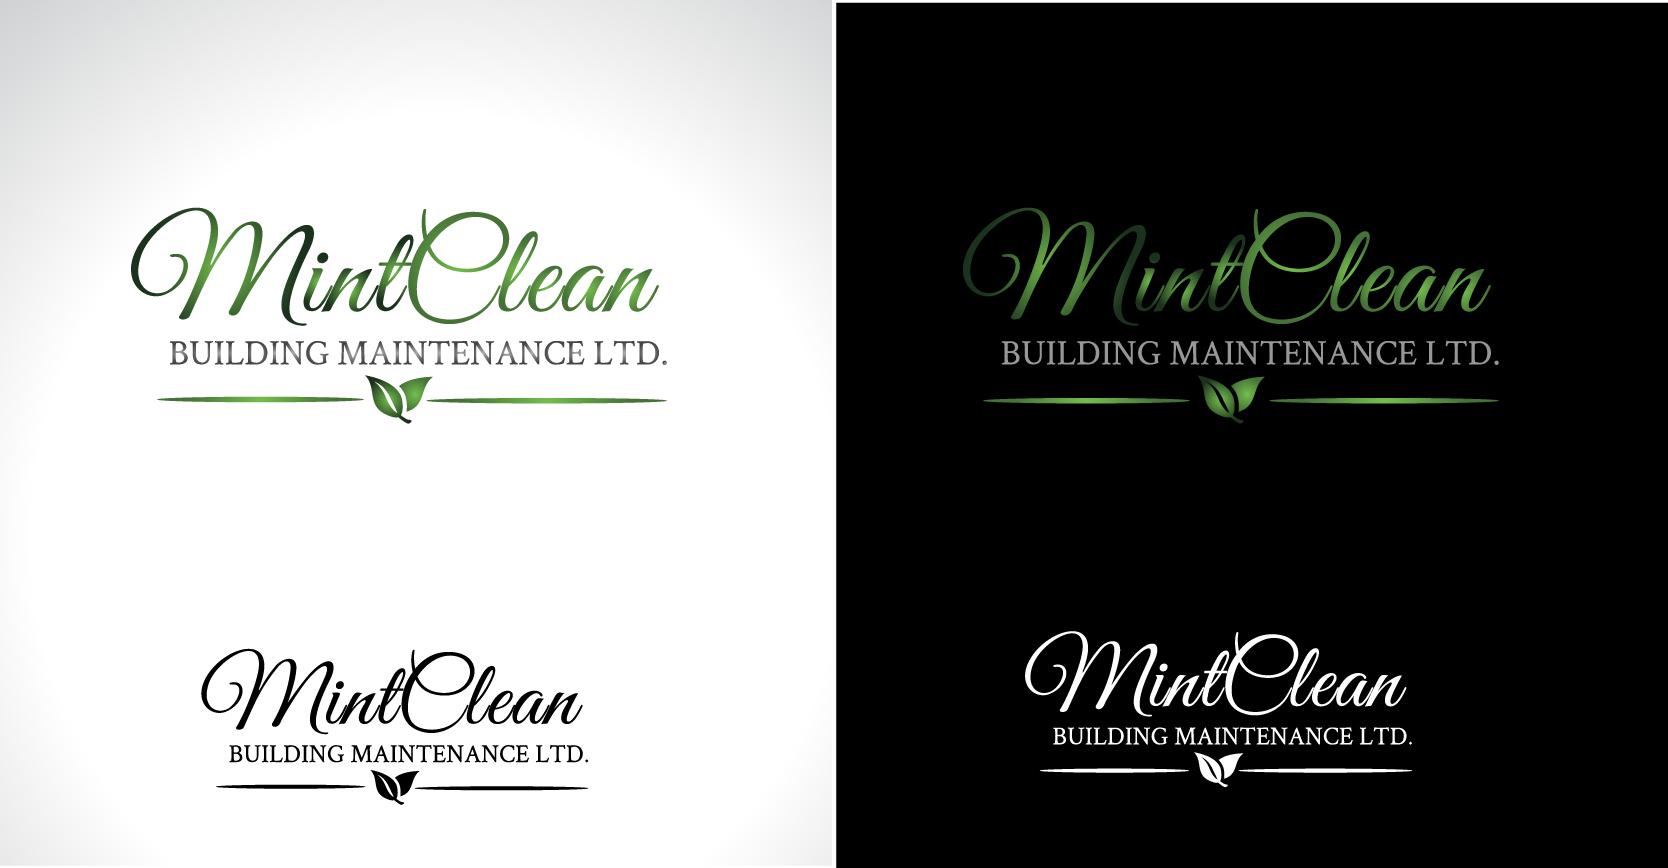 Logo Design by Darina Dimitrova - Entry No. 117 in the Logo Design Contest MintClean Building Maintenance Ltd. Logo Design.